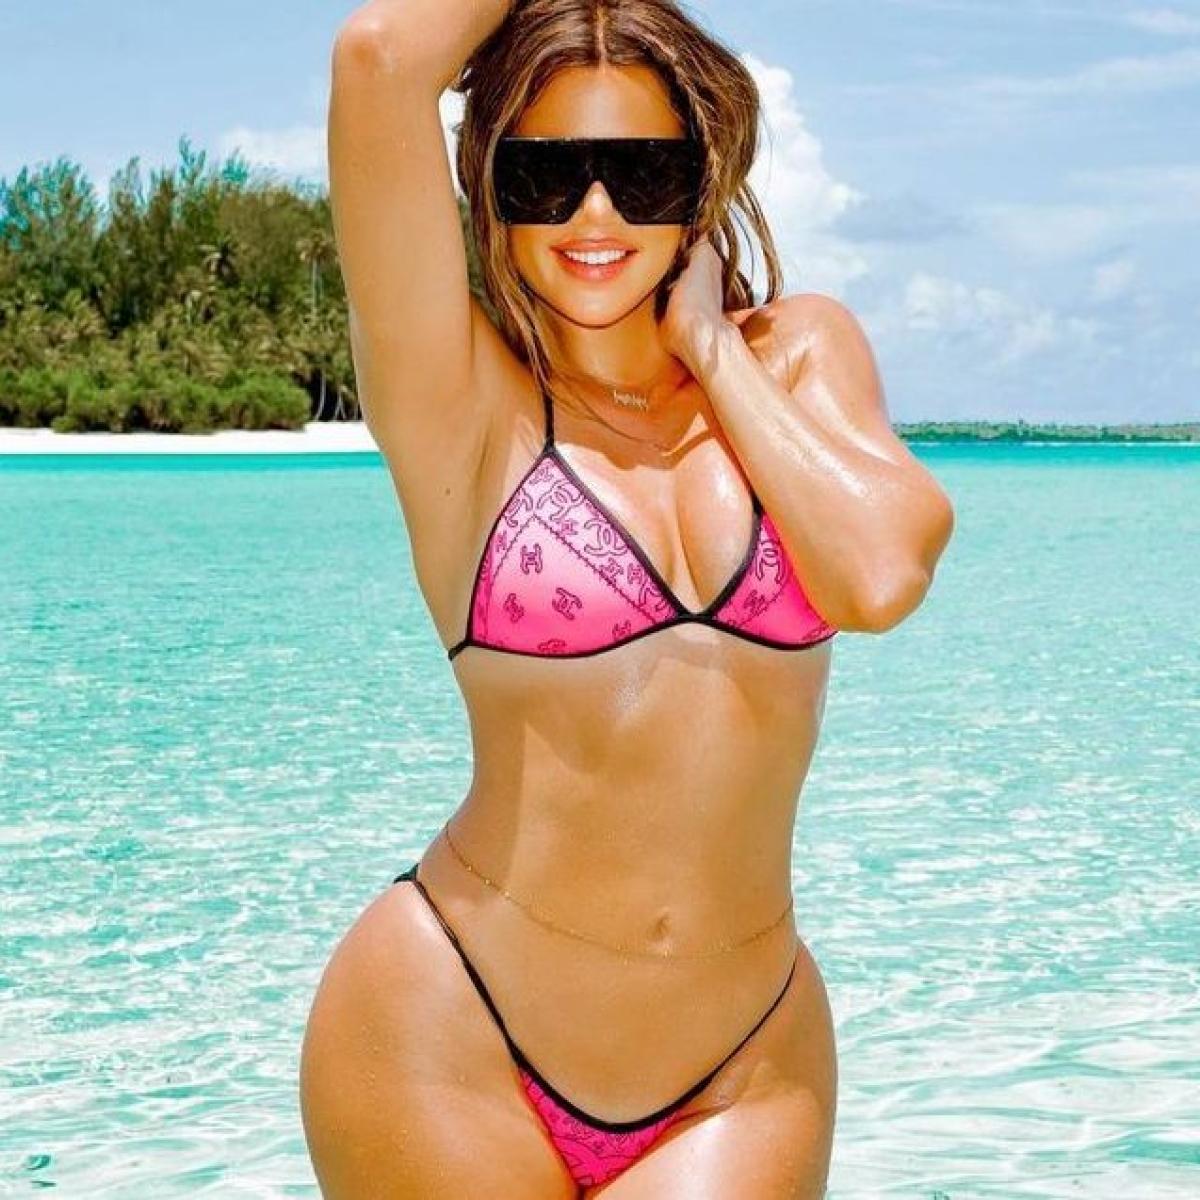 Khloe Kardashian flaunts hourglass body in a tiny bikini on exotic vacay